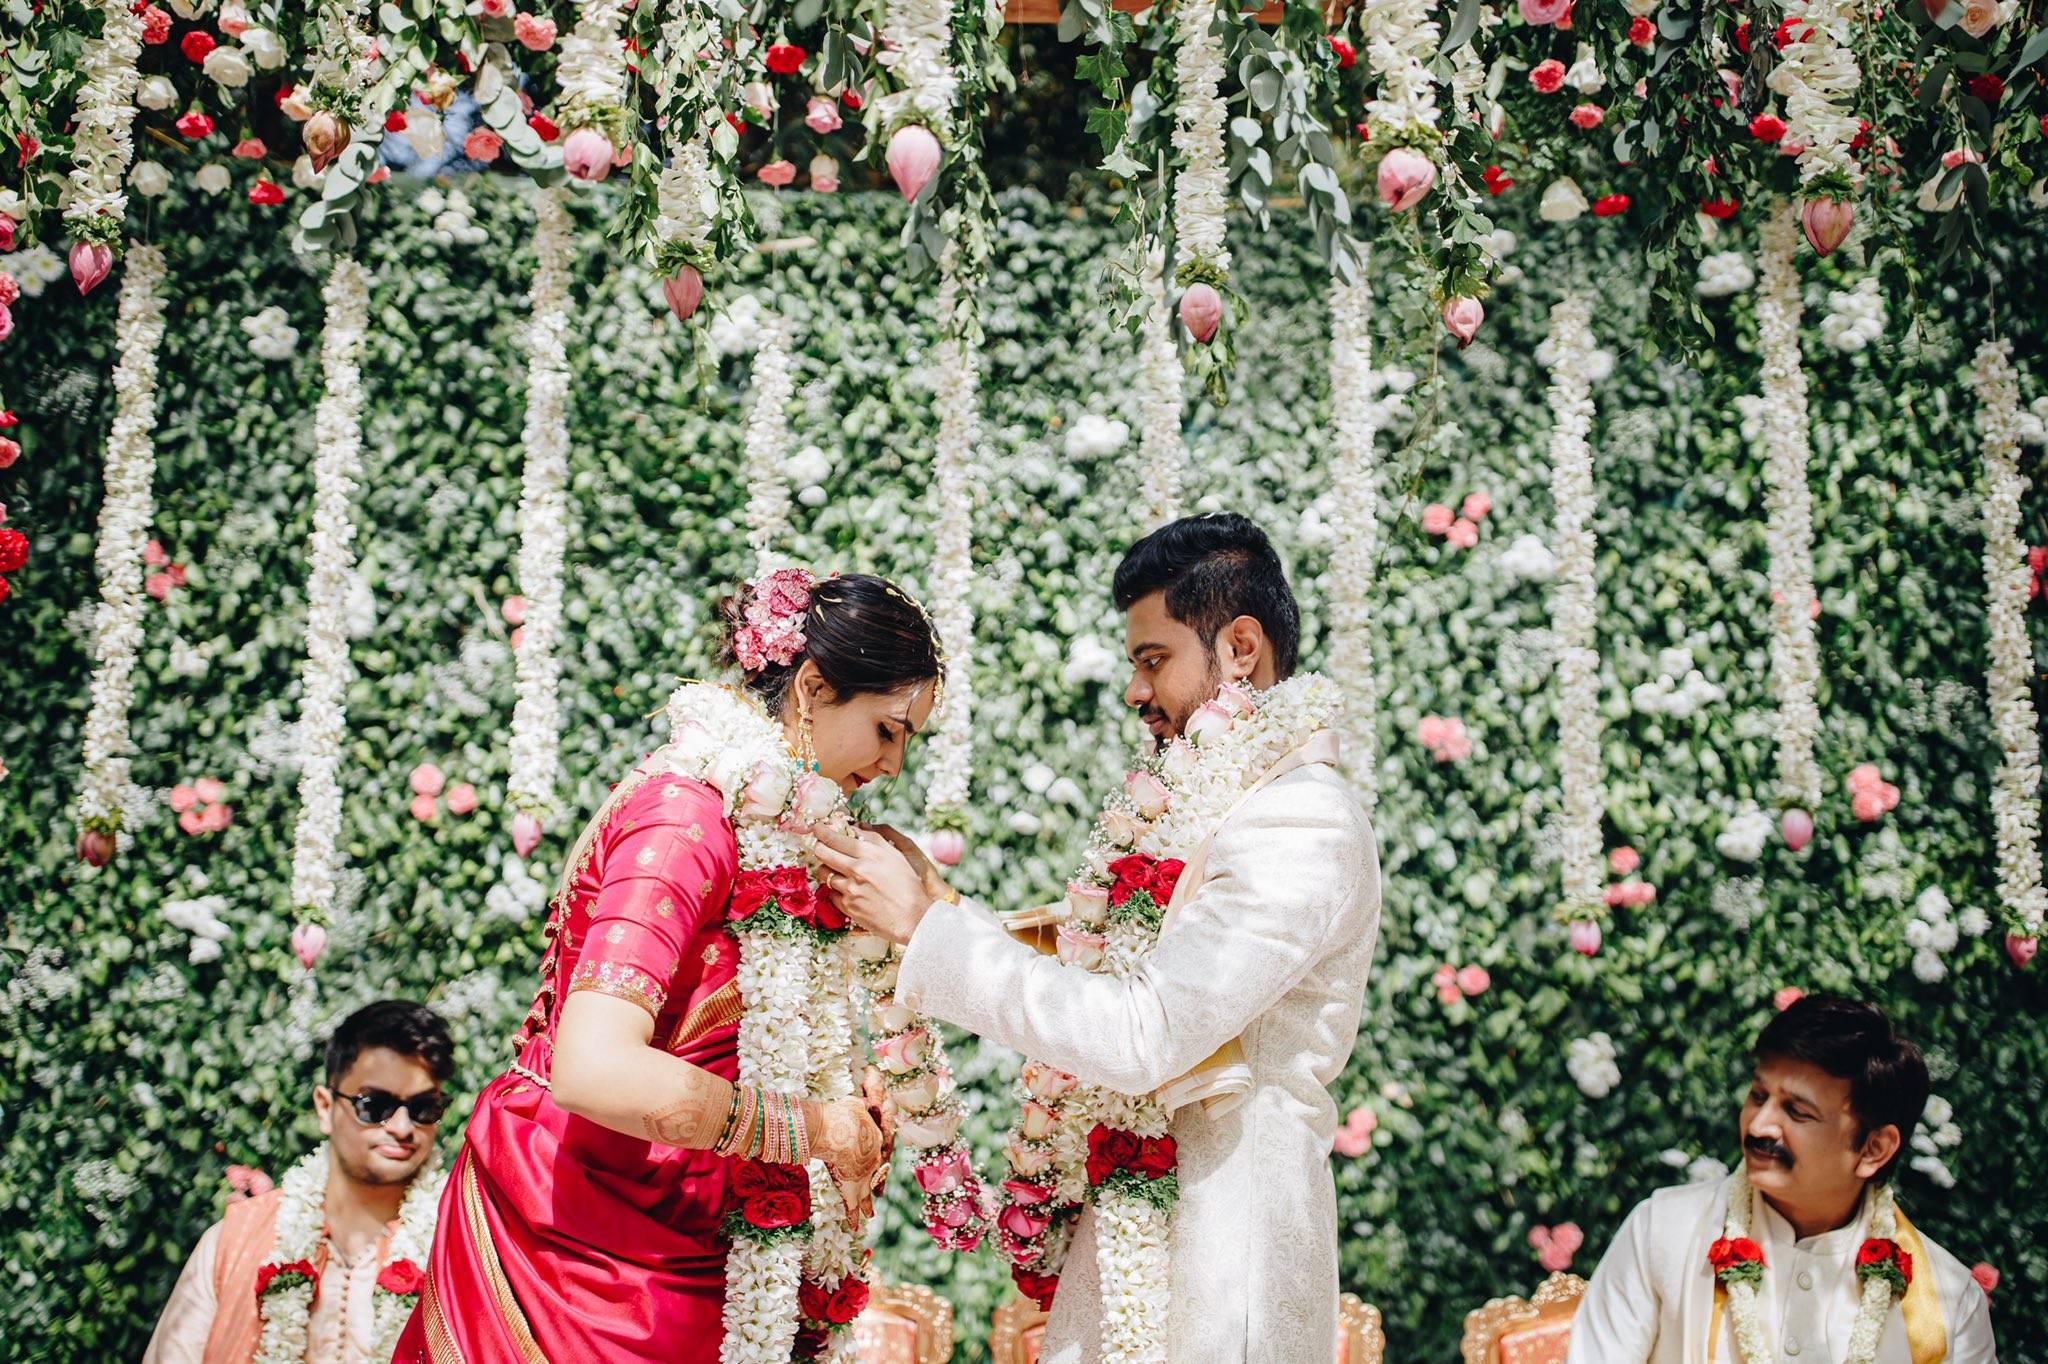 Ramesh Aravind Daughter NIharika Wedding 2